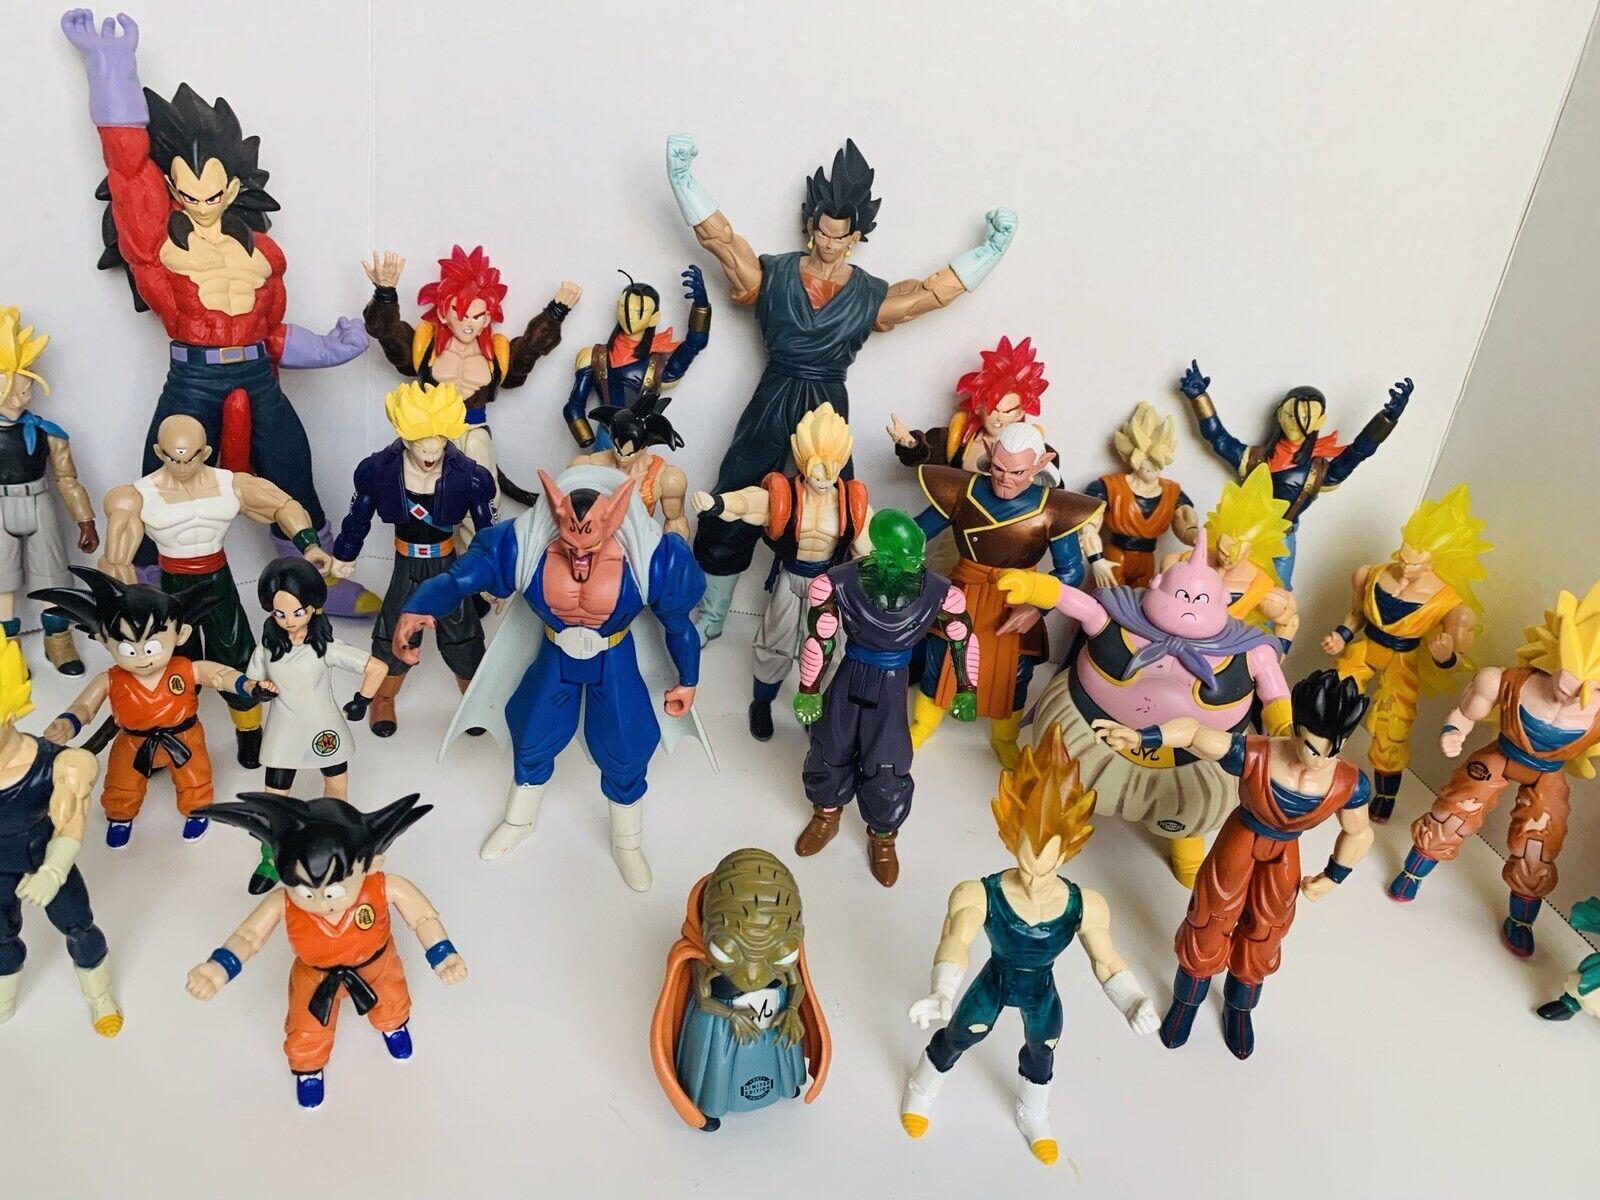 Jakks Pacific  Dragonball Z Action Figures Lot Rare  grand choix